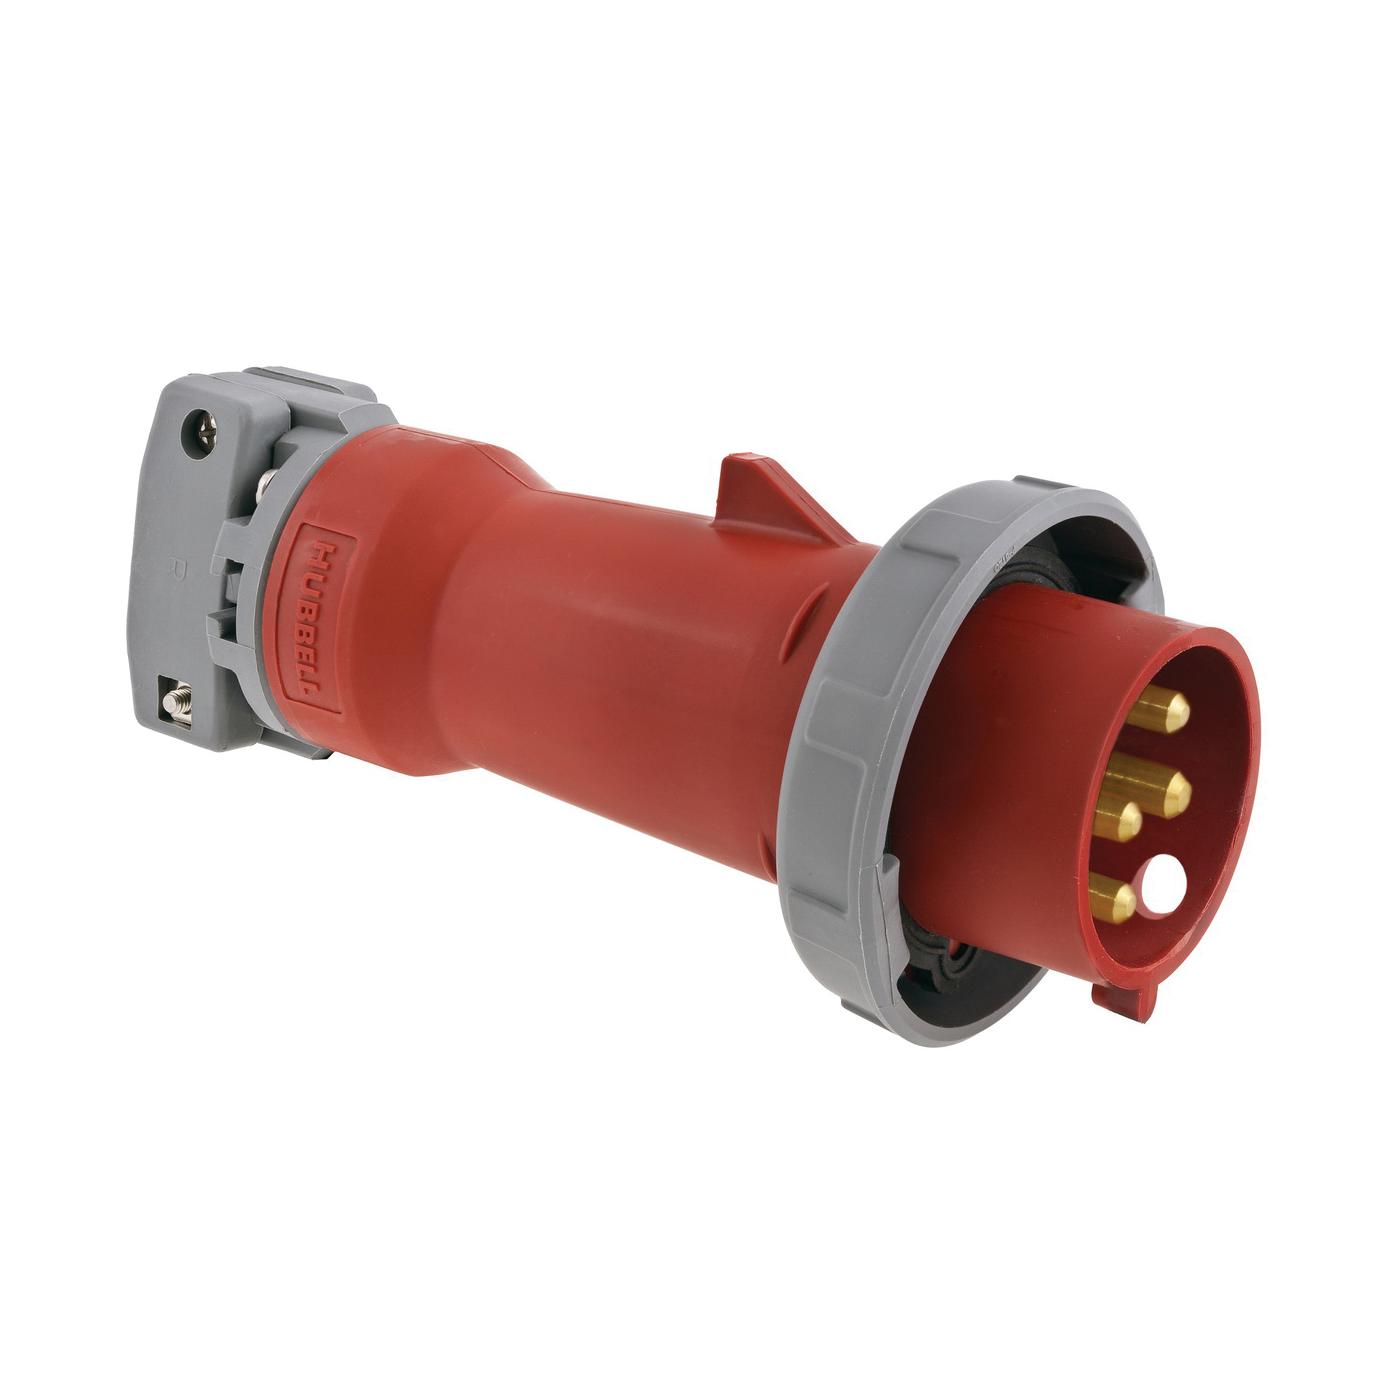 Wiring Device-Kellems HBLS460P7W